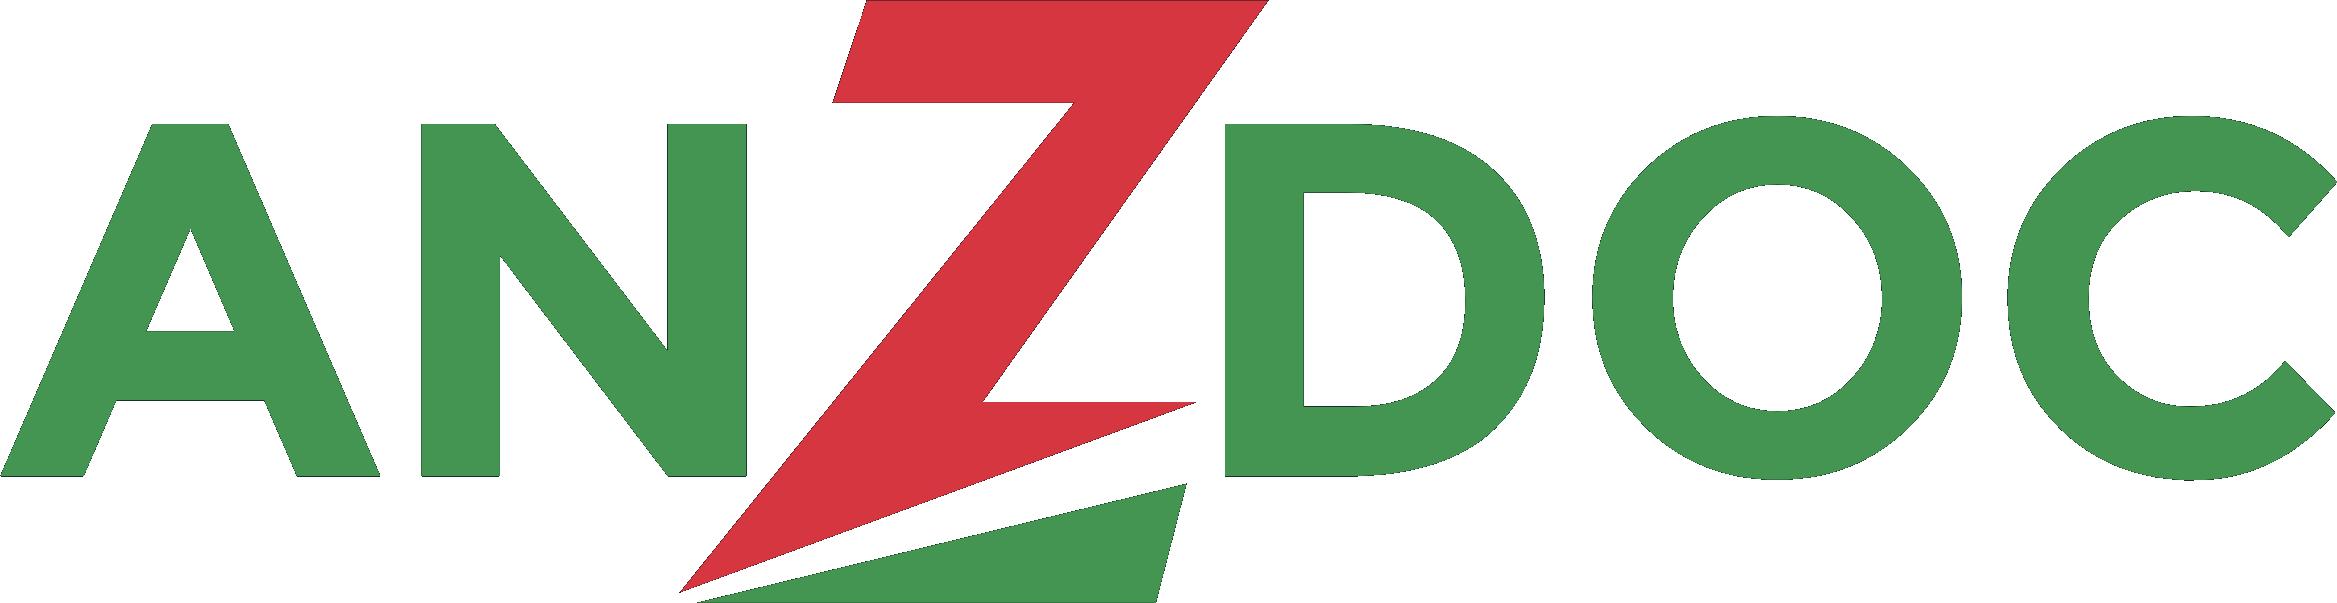 Epehólyag- és epeúti daganatok | Hungarian Oncology Network - bestcarwash.hu